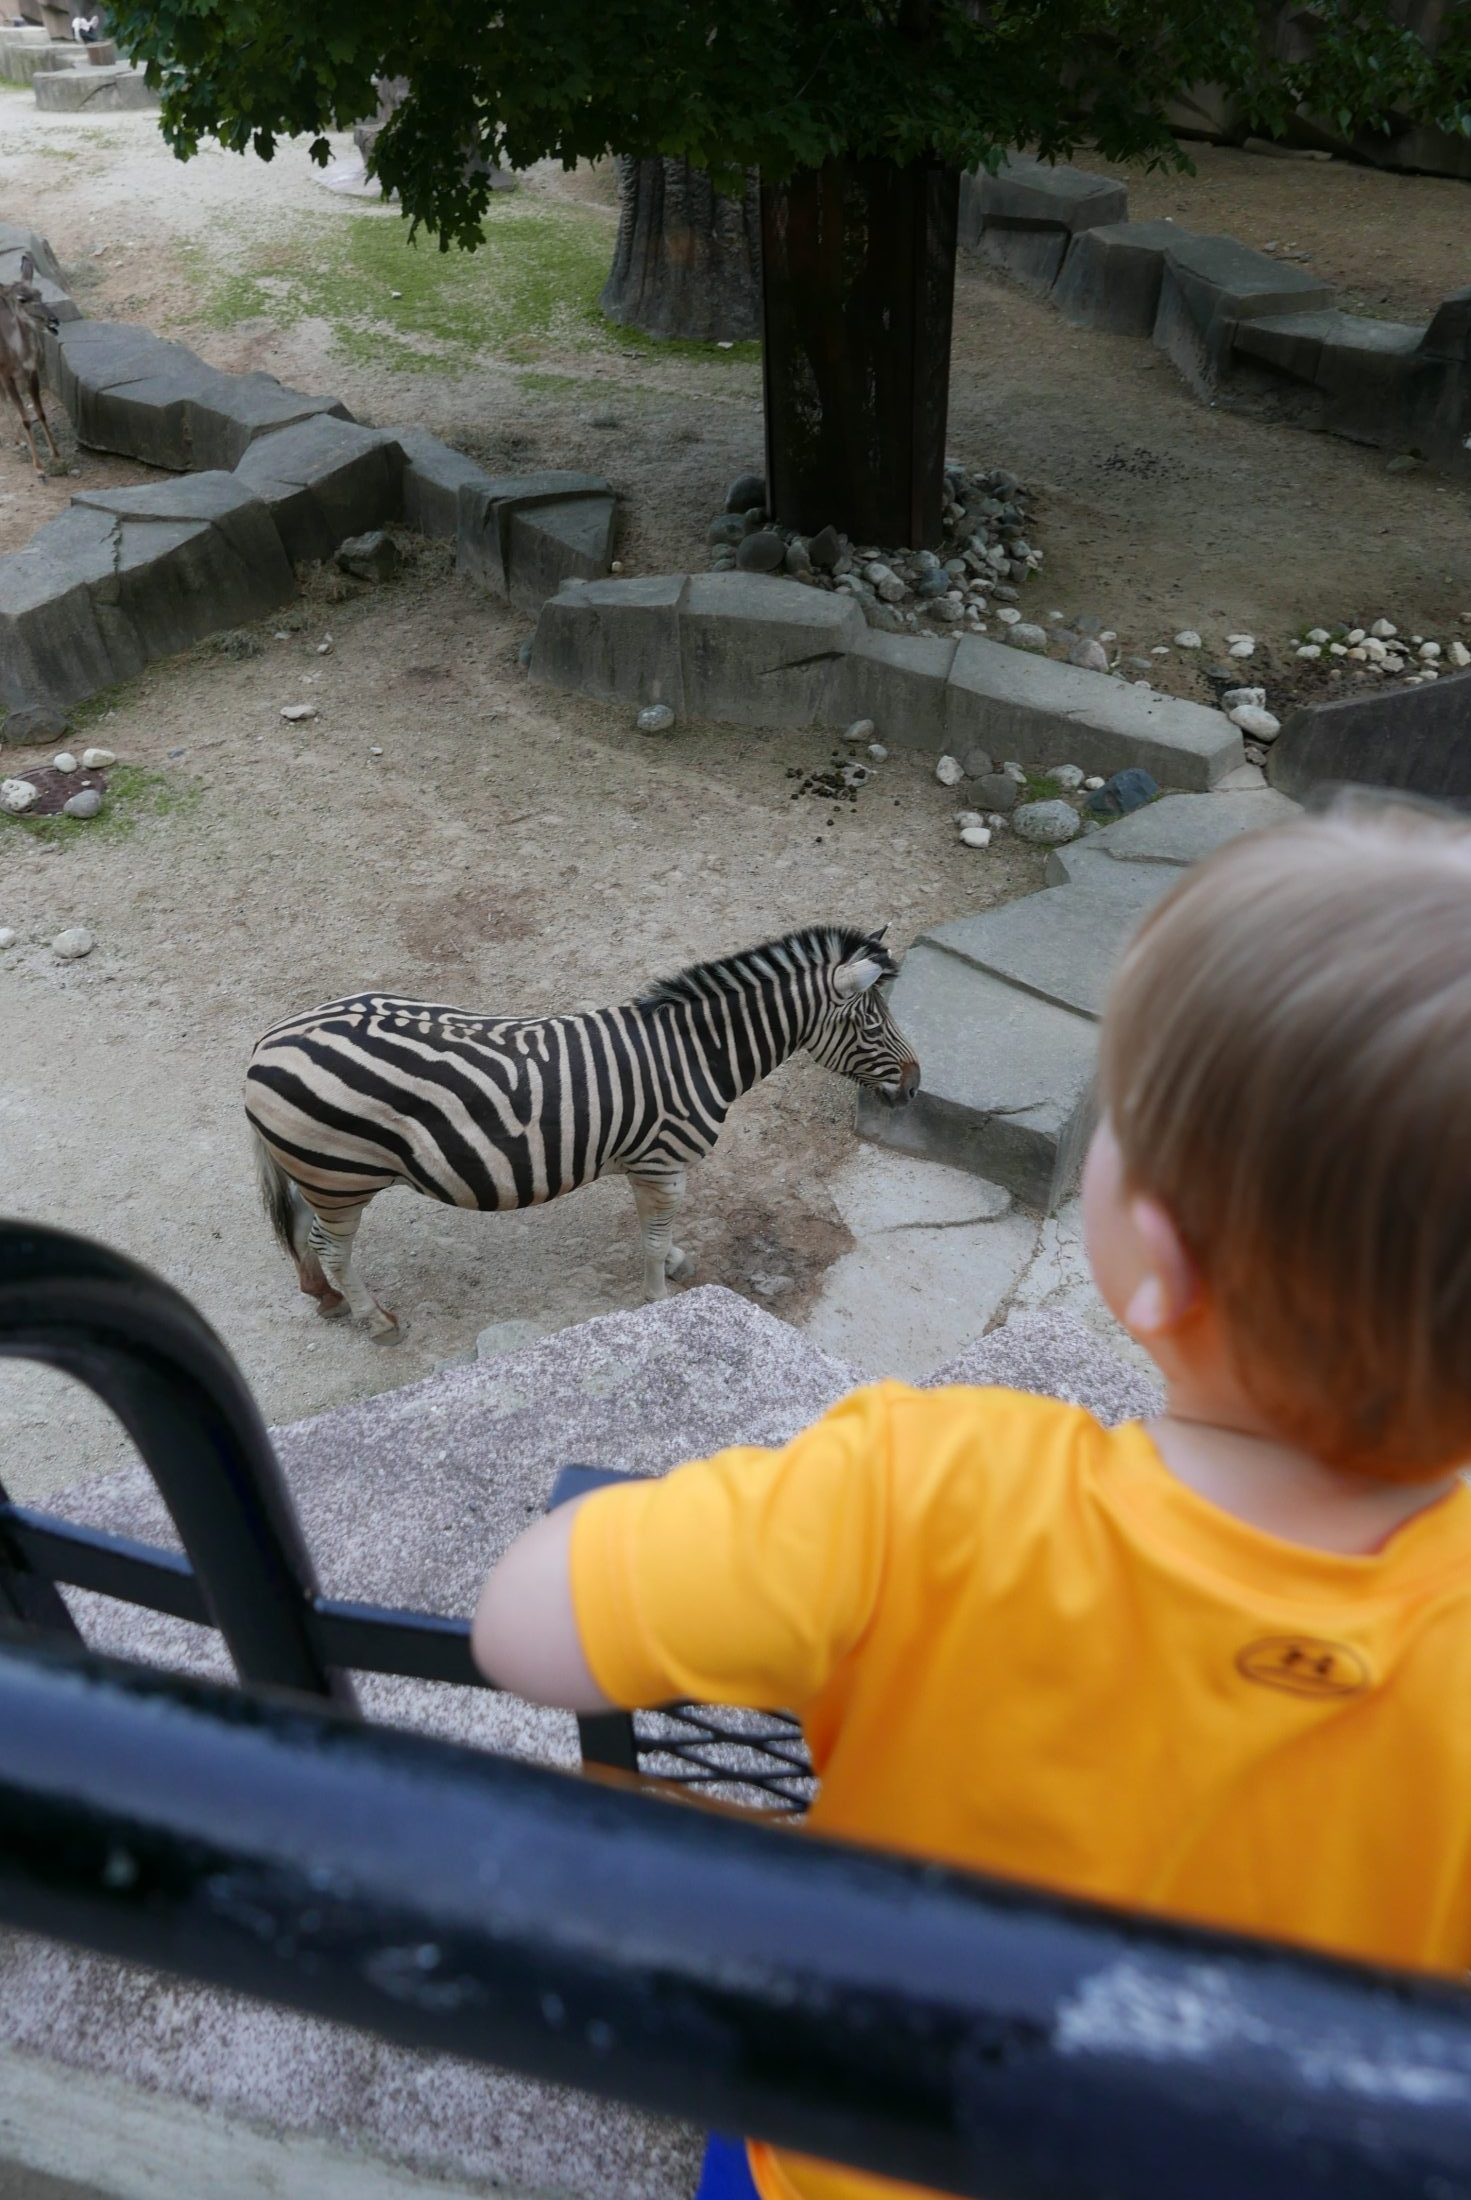 Zebras @ Milwaukee Co. Zoo